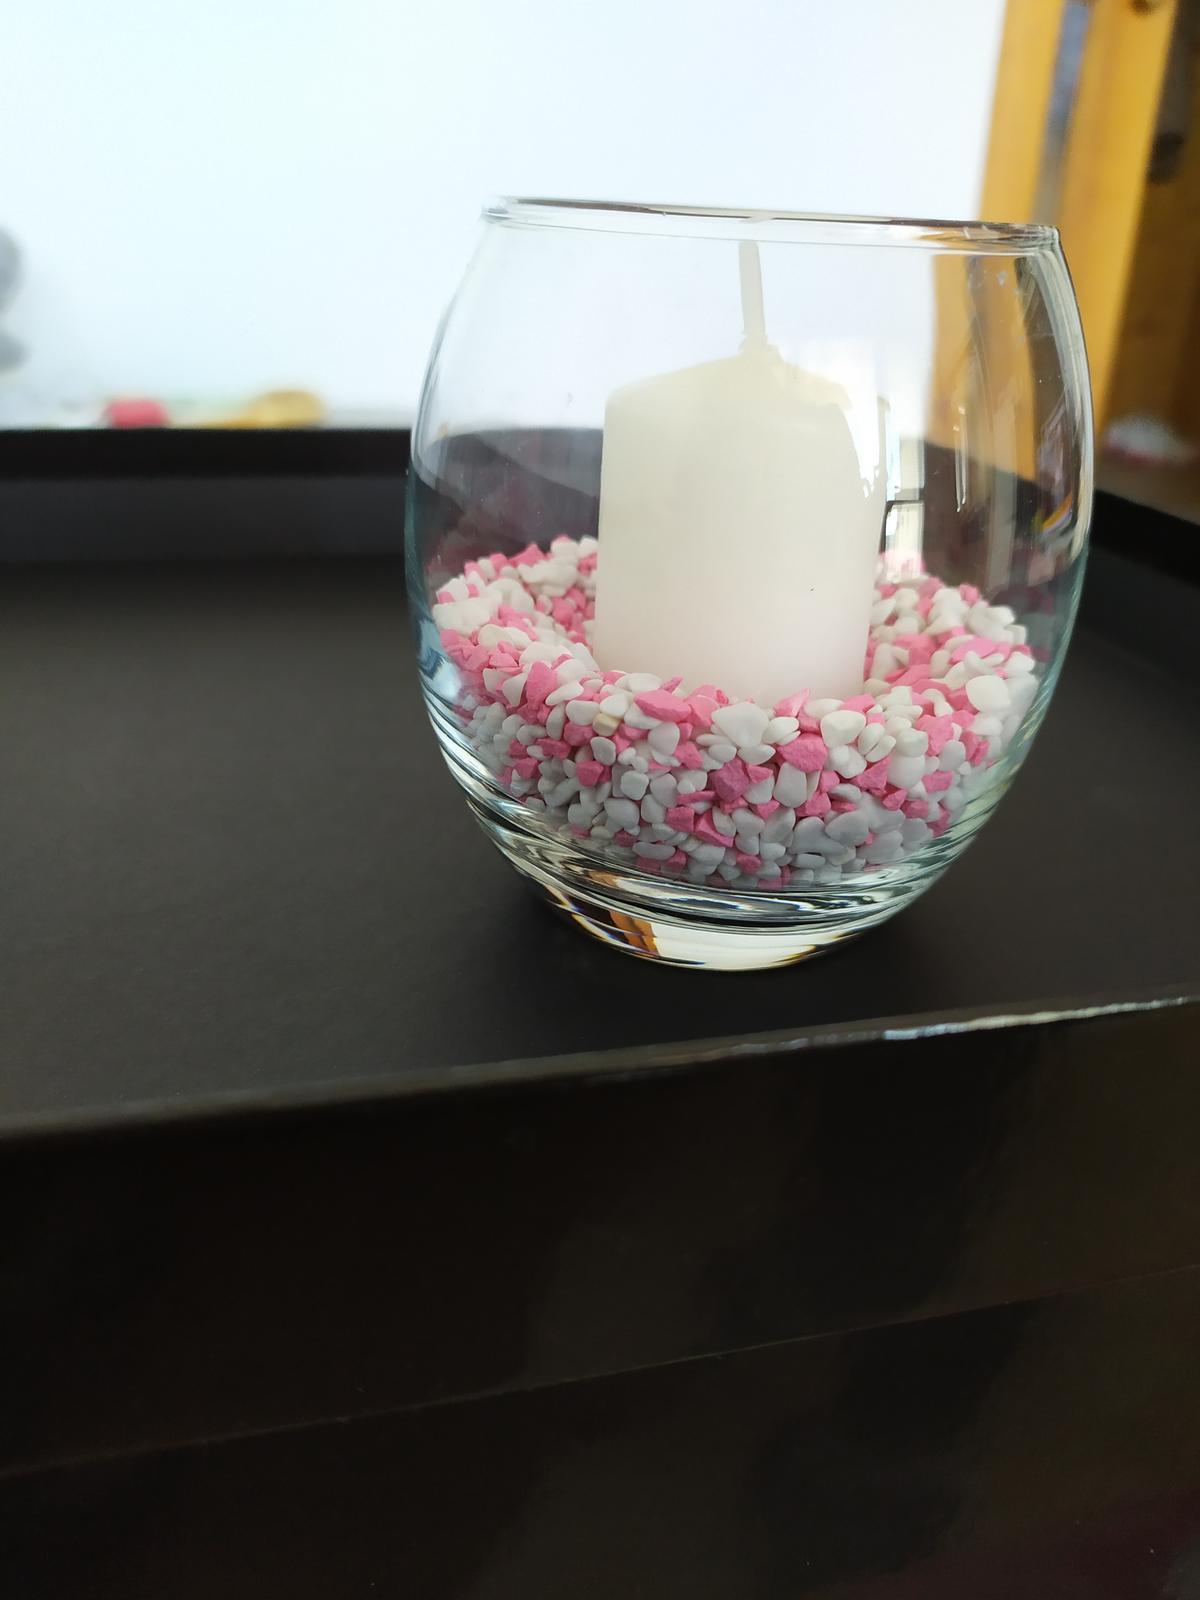 Biele sviečky so svietnikom - Obrázok č. 1